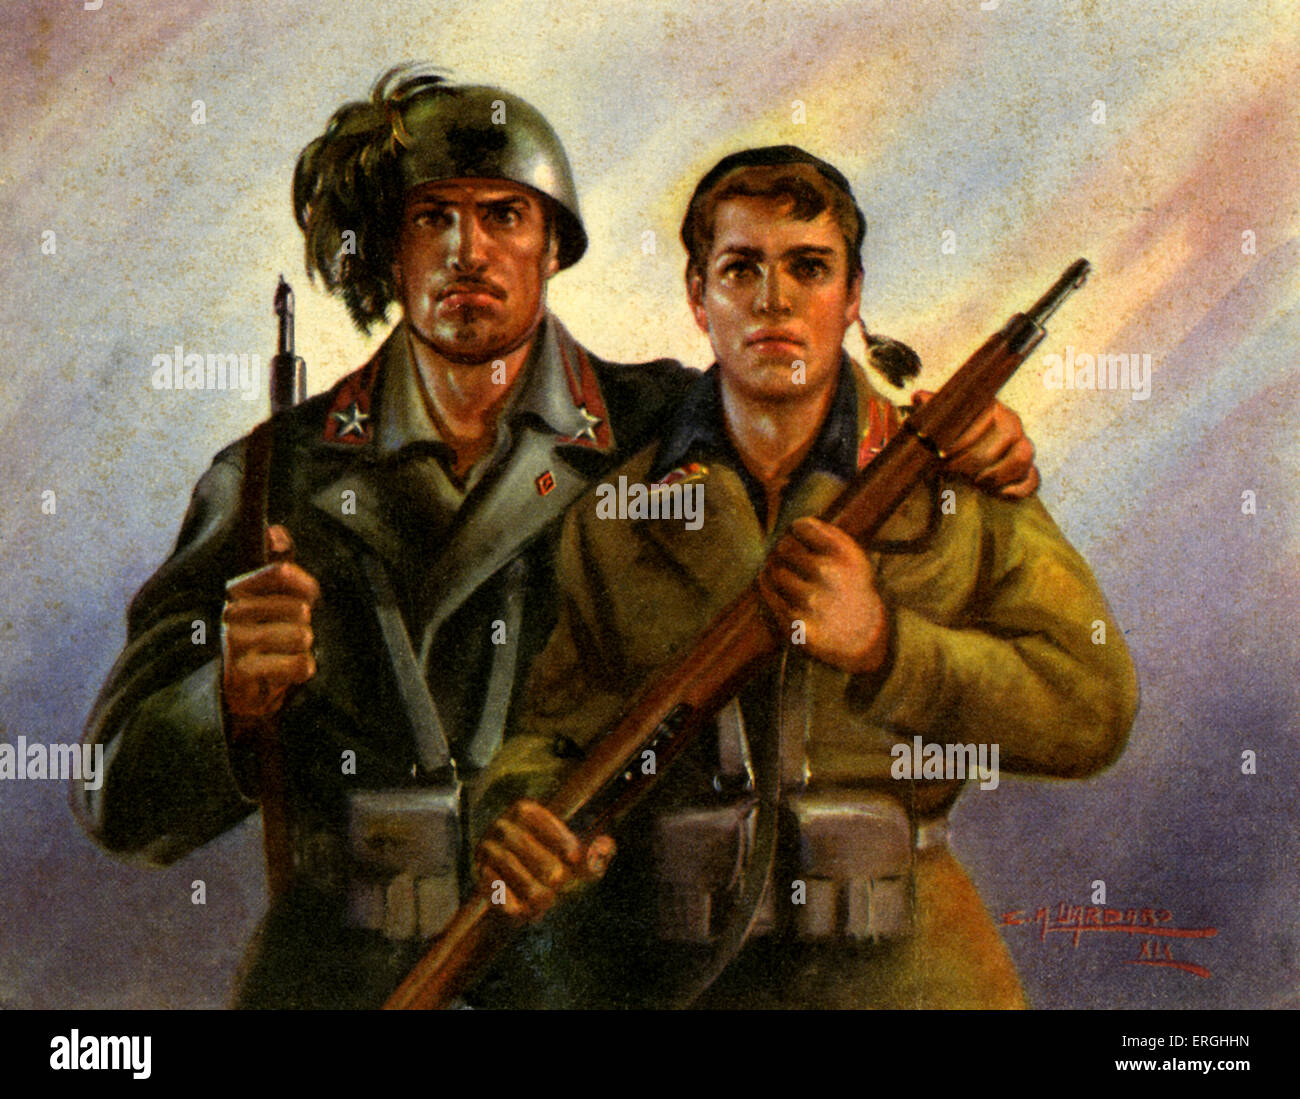 WW2: Italian Young Fascist Volunteer Batallion (Battaglioni Volontari Giovani Fascisti), Italian postcard, c. 1945 - Stock Image